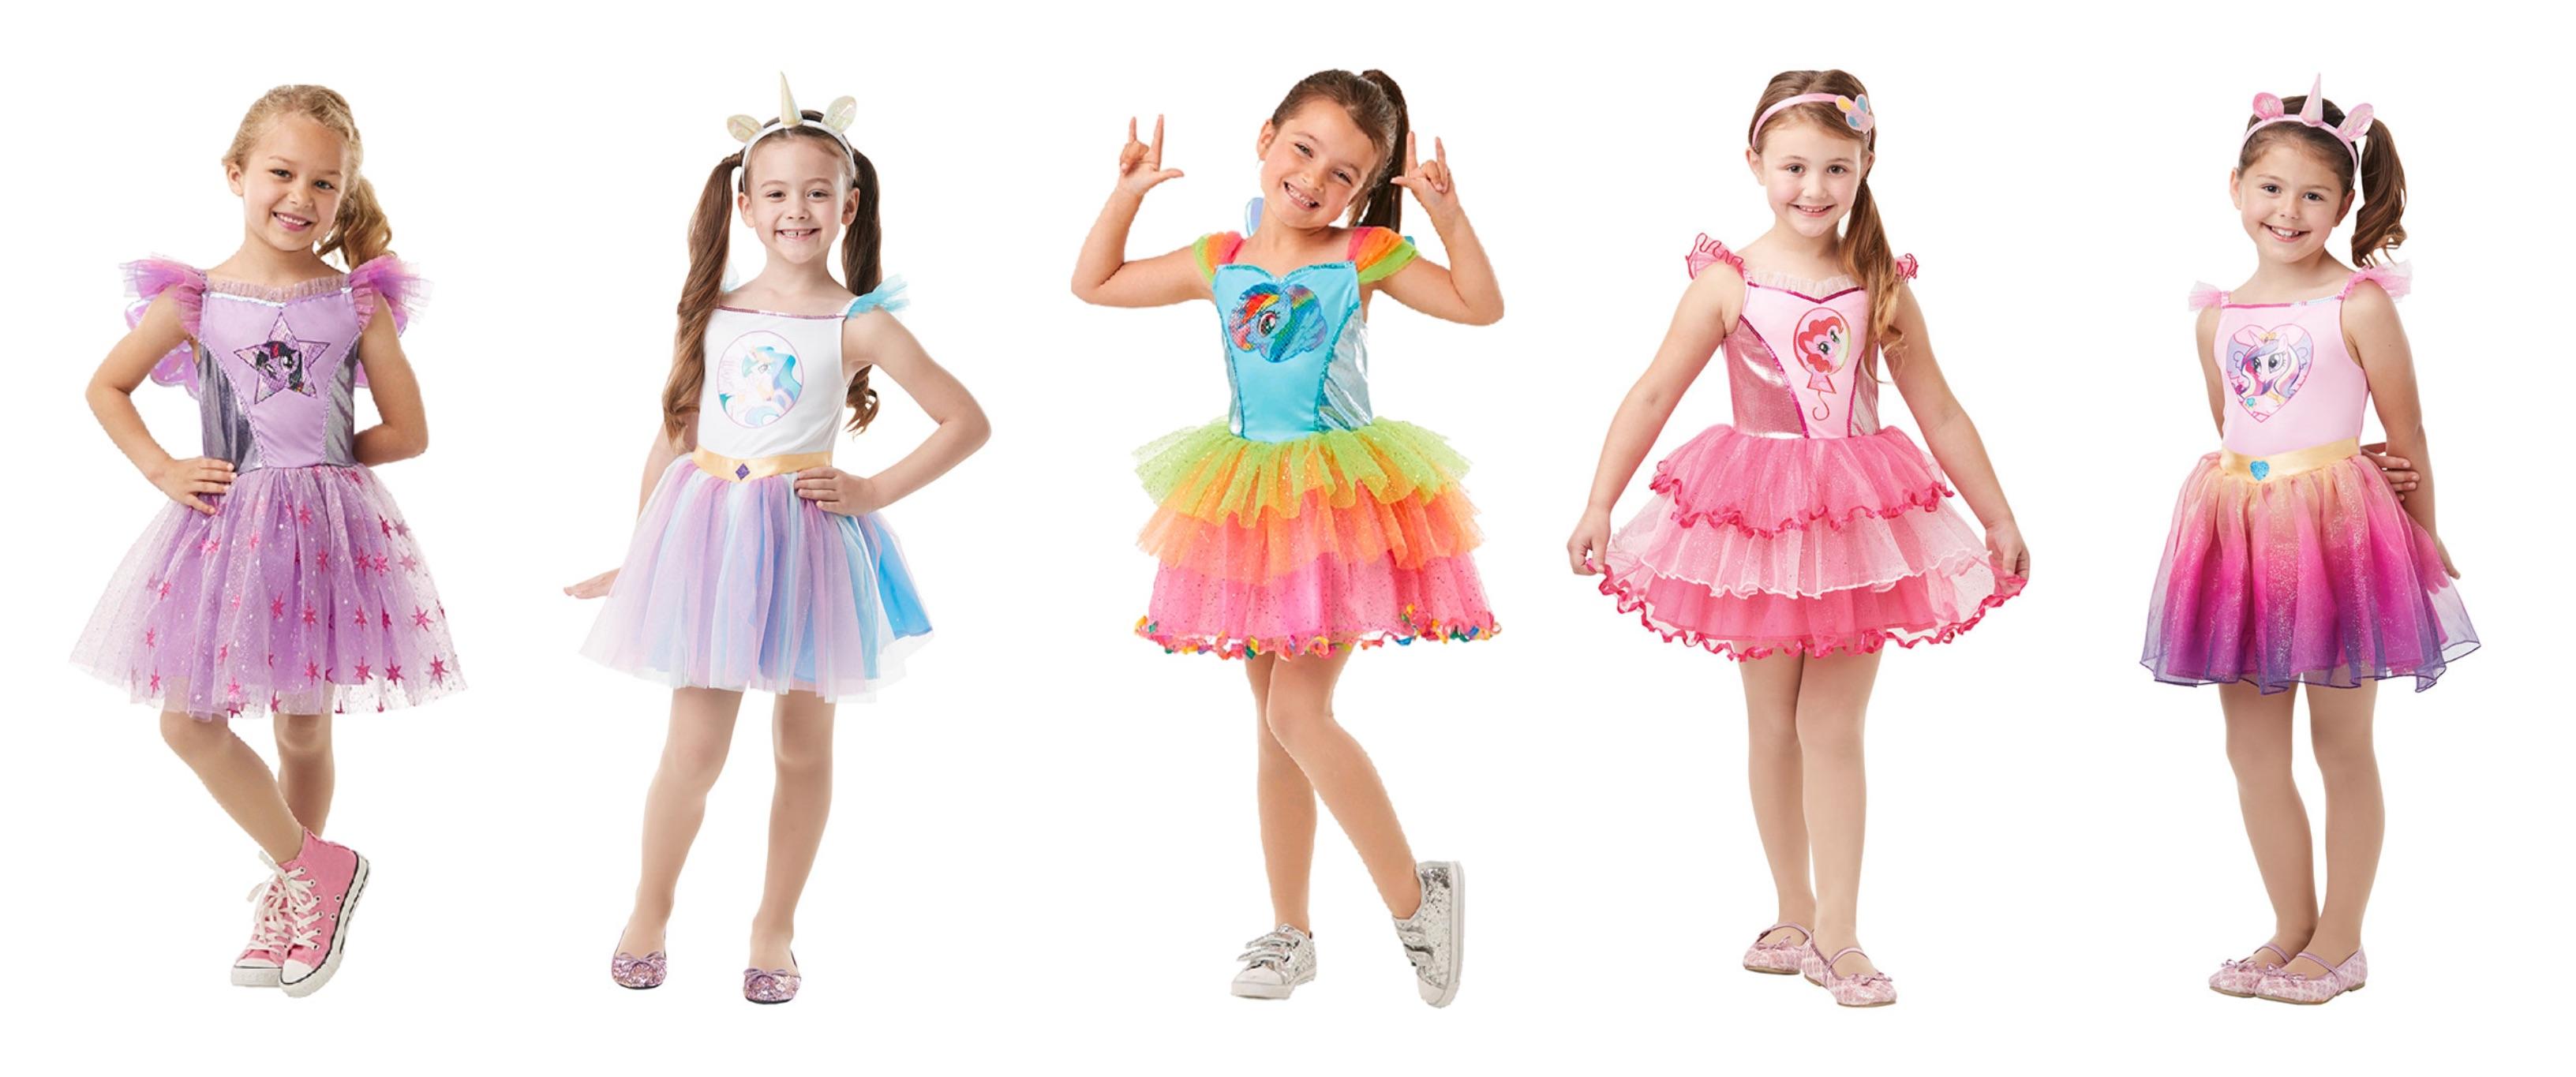 my little pony kostume til børn - My little pony kostume til børn